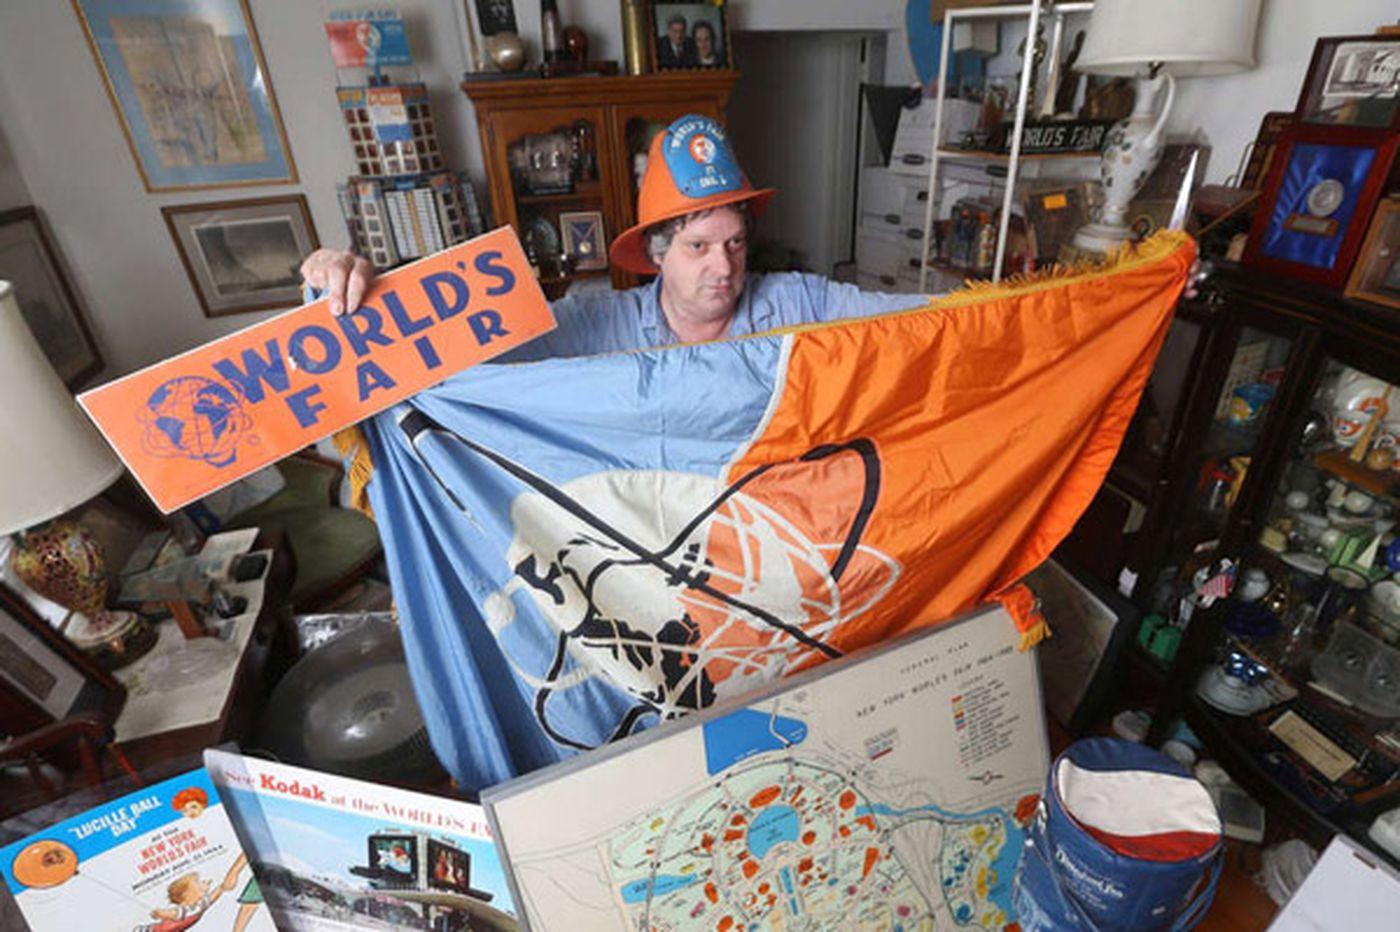 New Jersey man boasts world-class World's Fair memorabilia collection